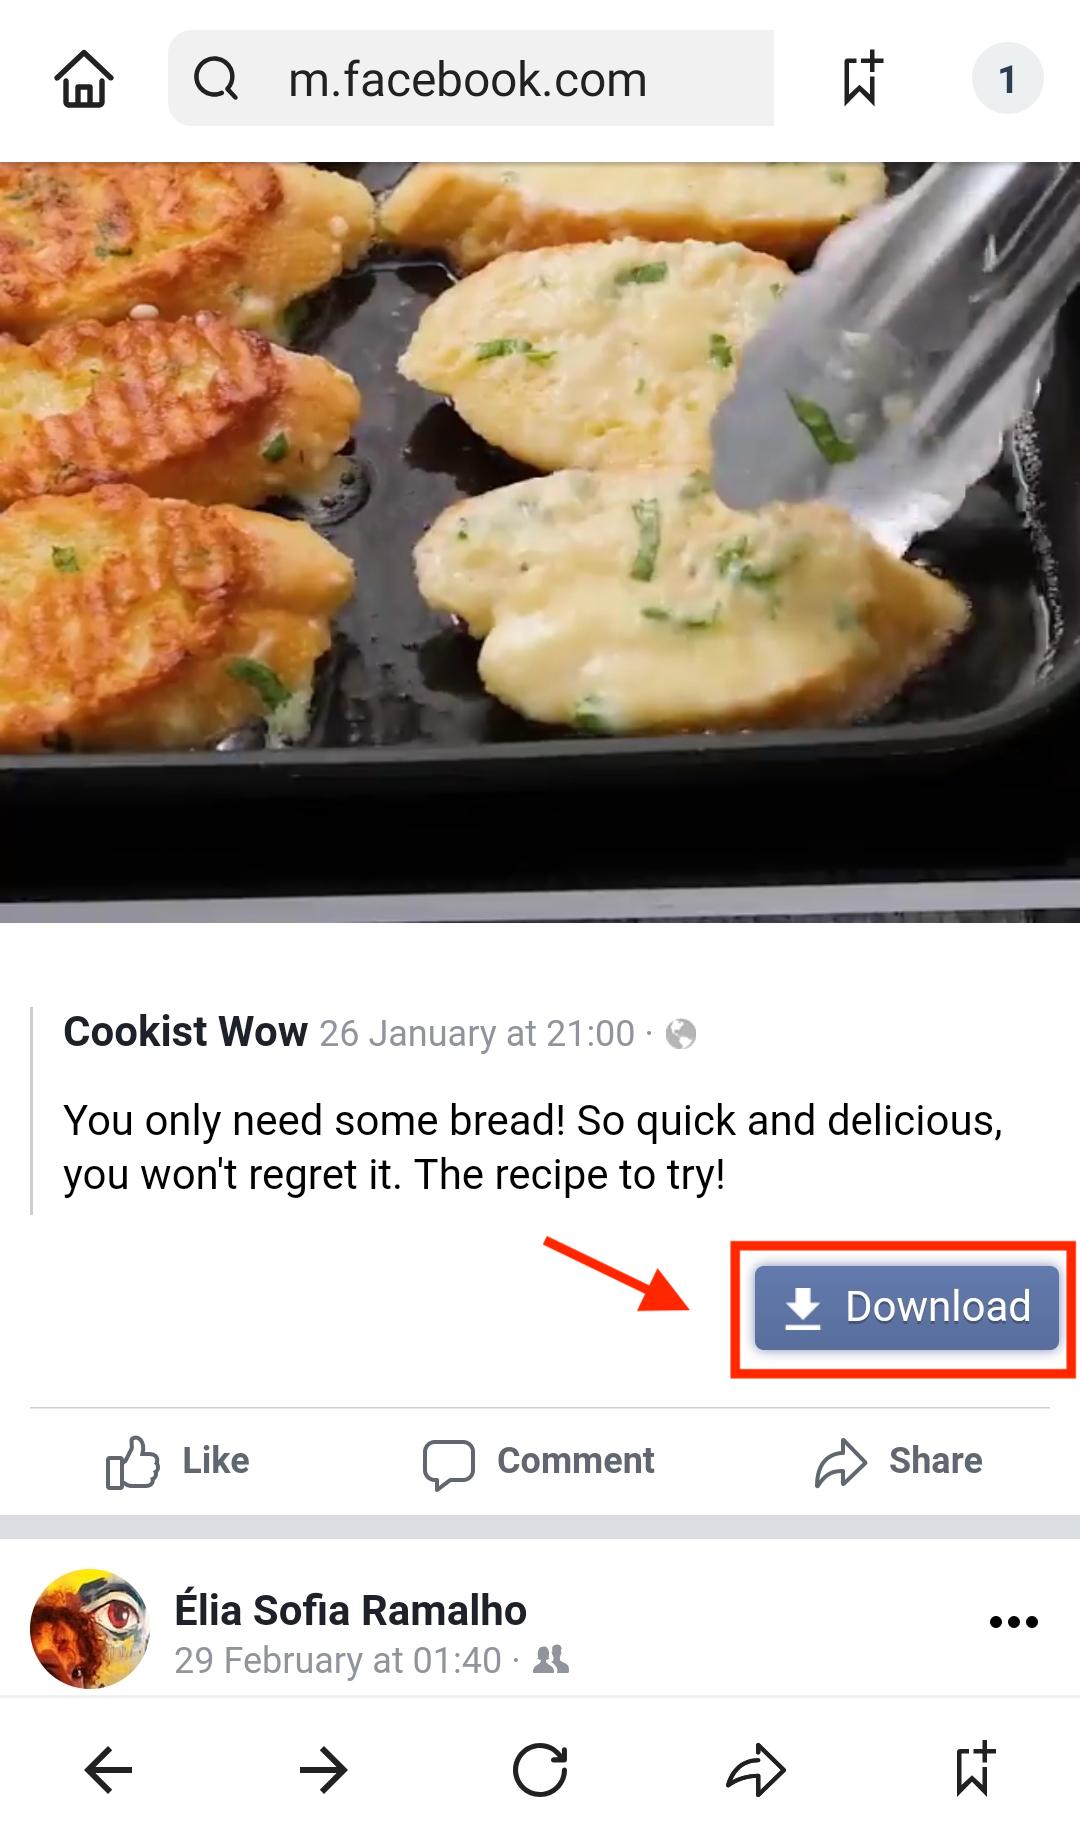 aplicativo para salvar vídeo do facebook